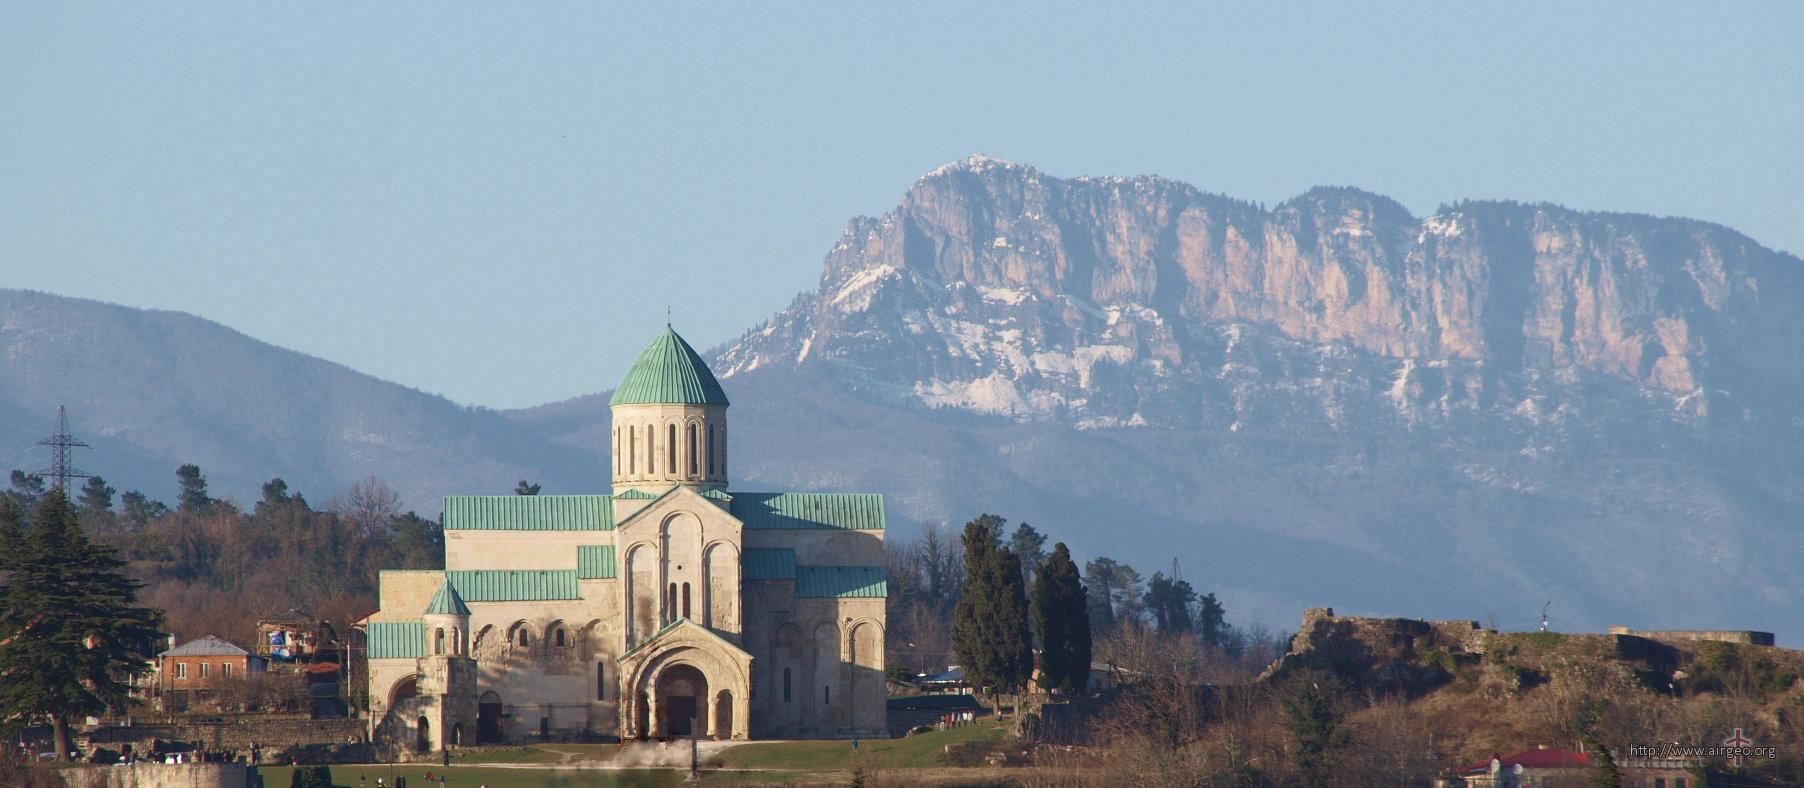 Грузия - Кутаиси - Баграти